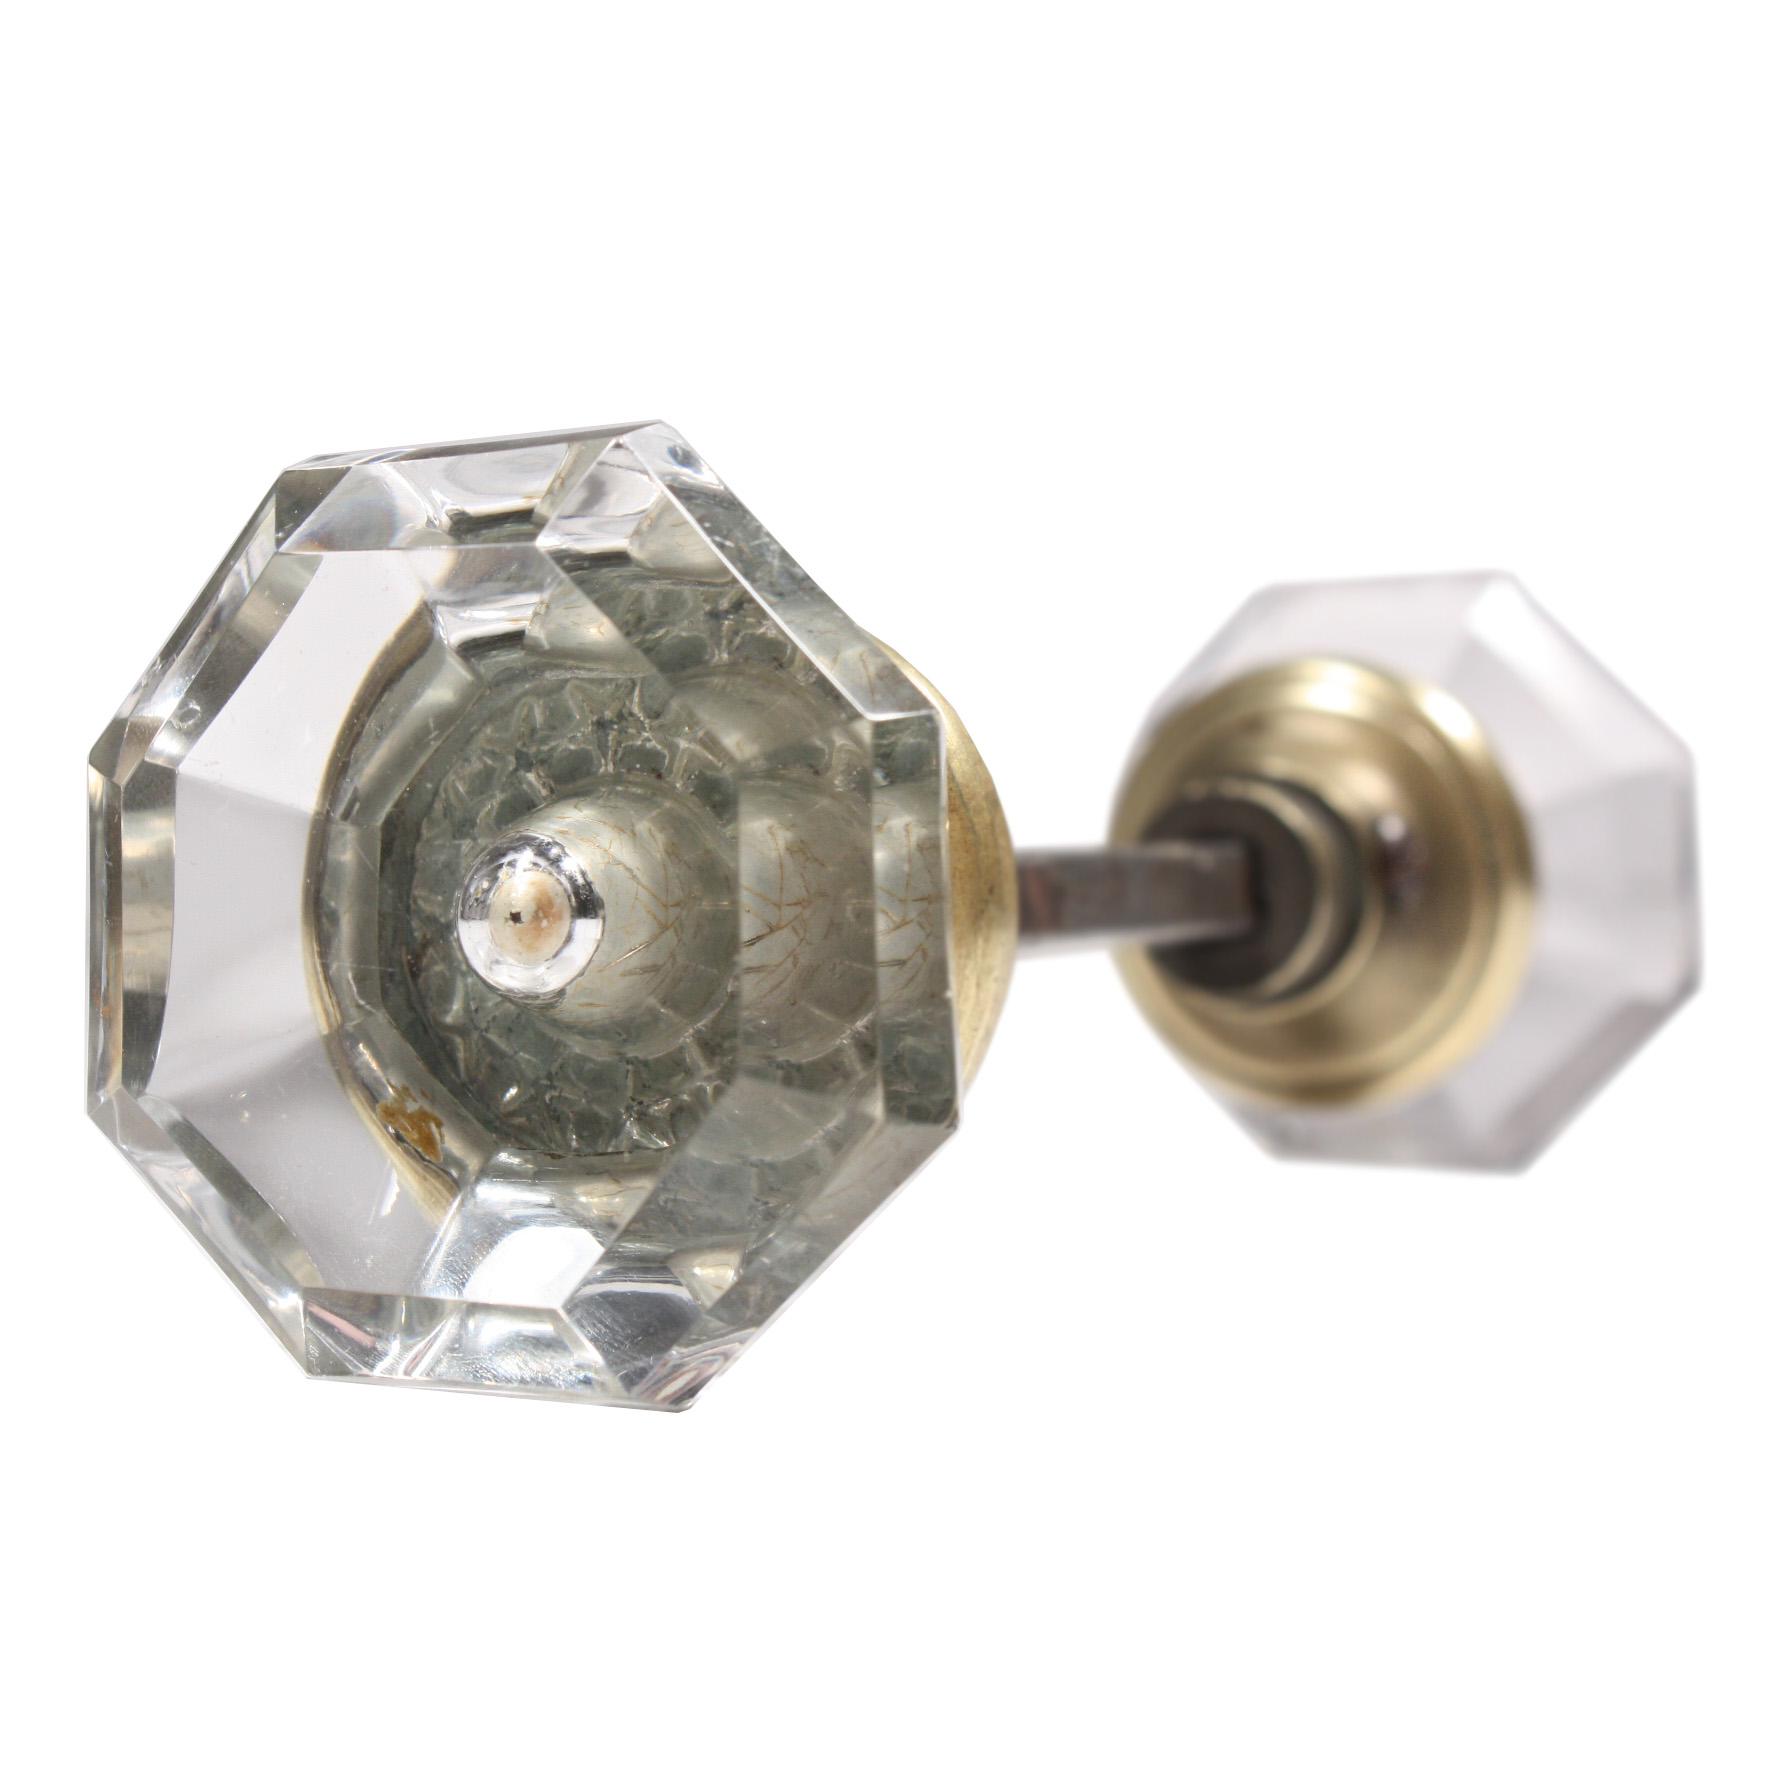 antique glass door knobs for sale photo - 20